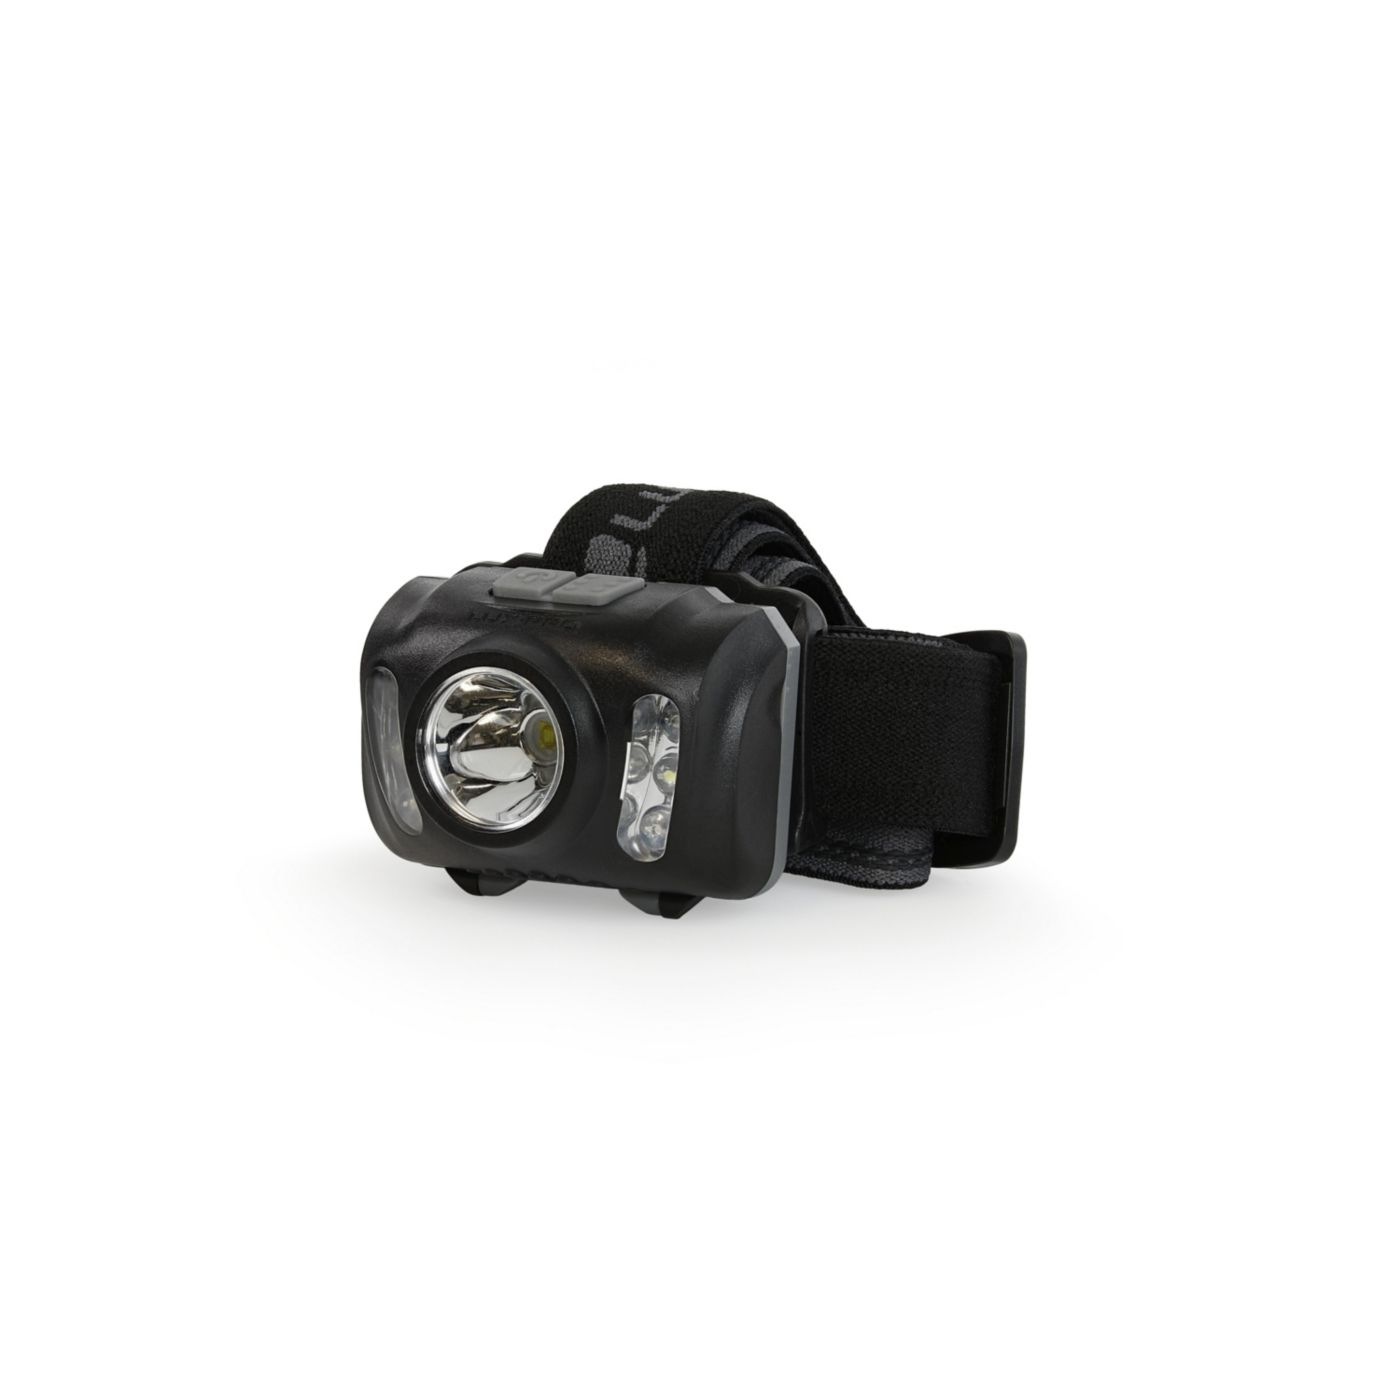 Lux Pro LED Dual Switch Headlamp